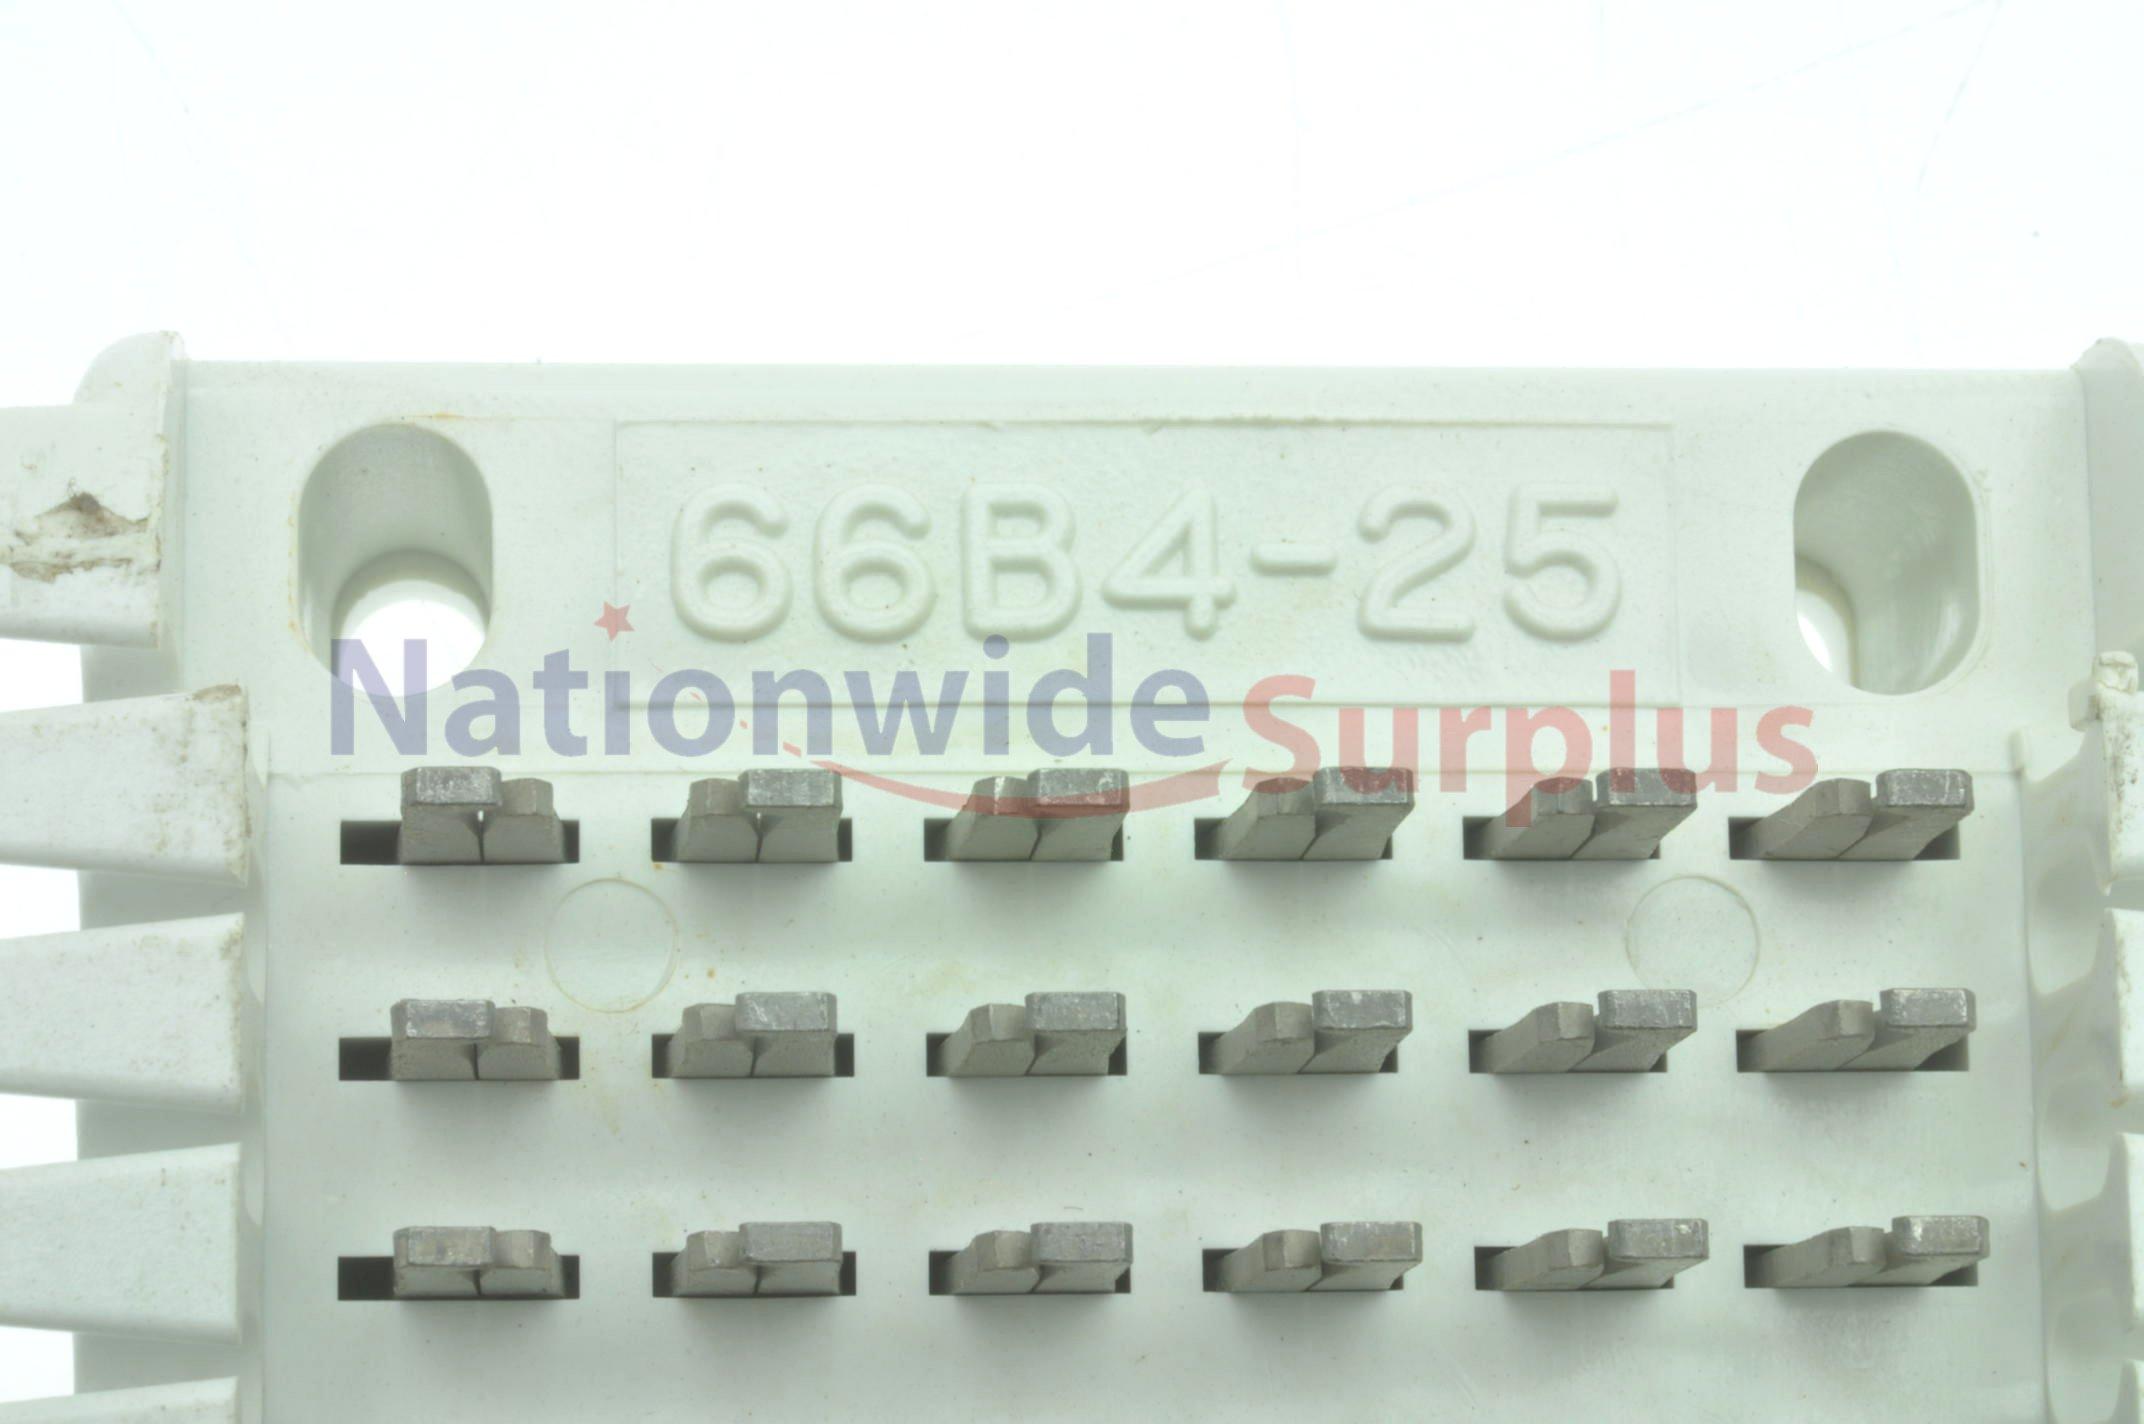 66 block wiring diagram 25 pair 2001 ford f150 xl radio lot of 7 leviton standard telephone terminal punch down